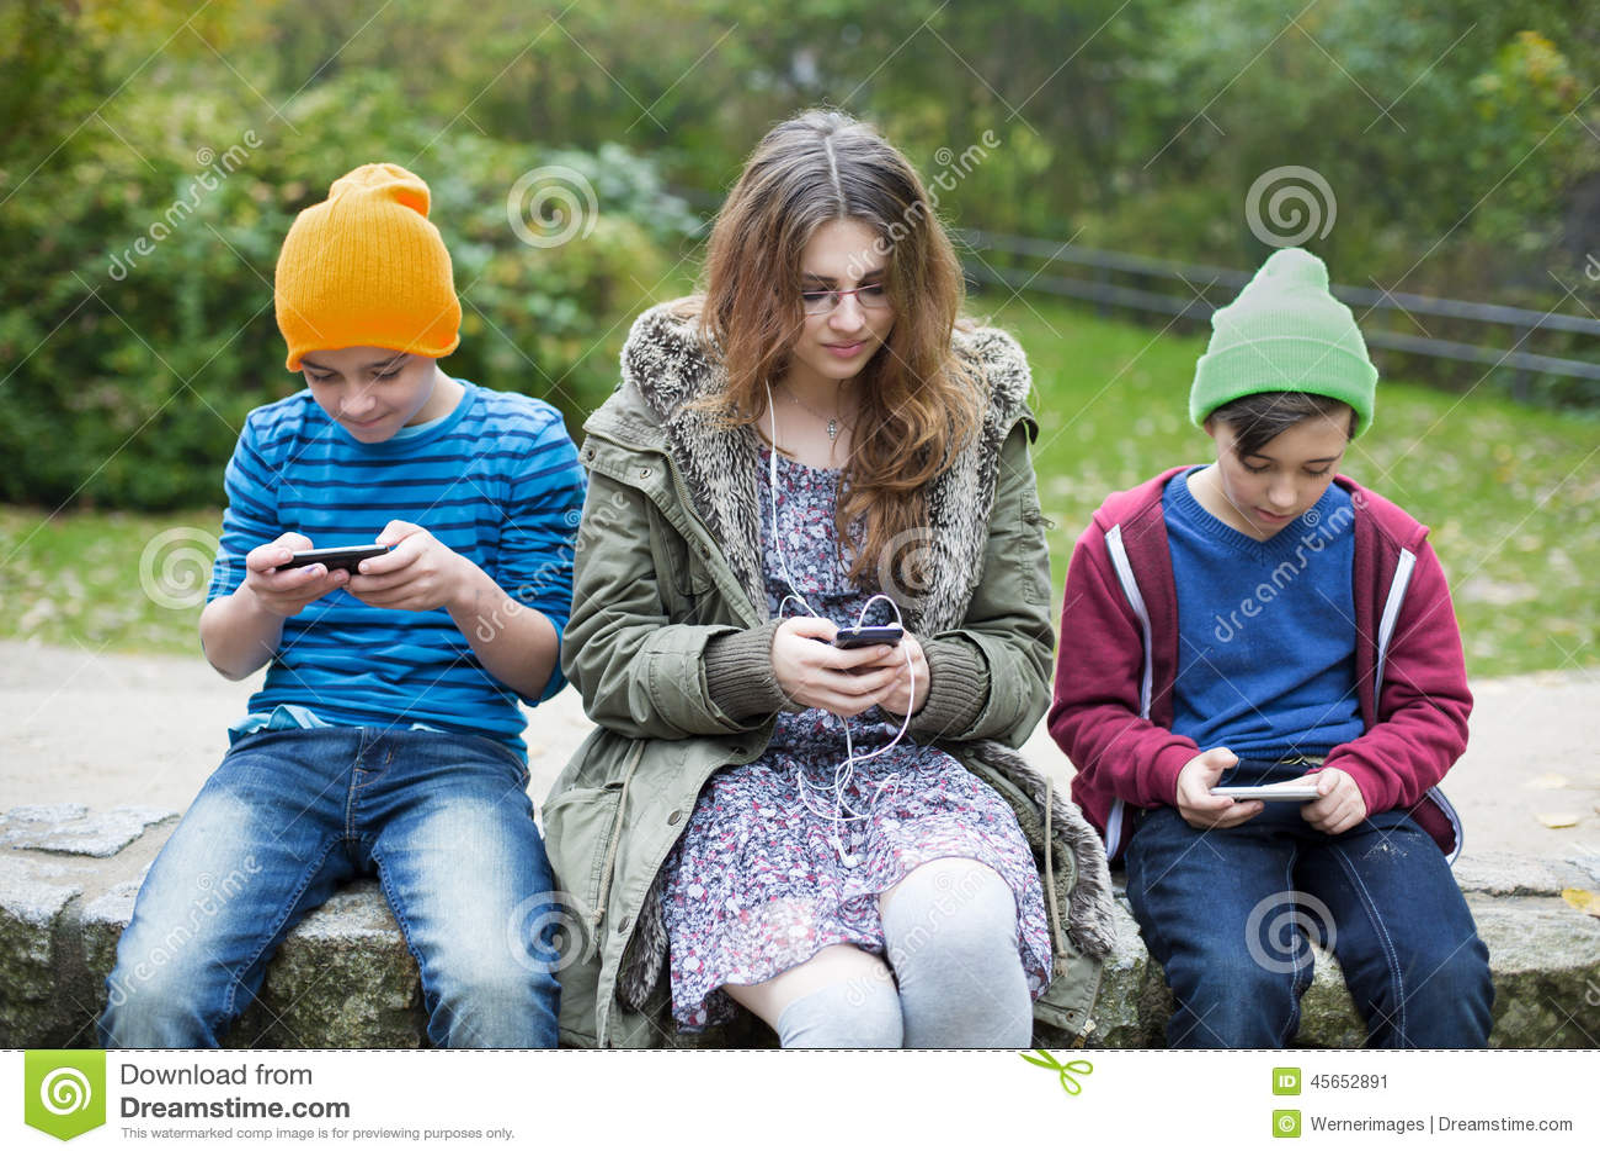 Full nangi videos a boy and girl download